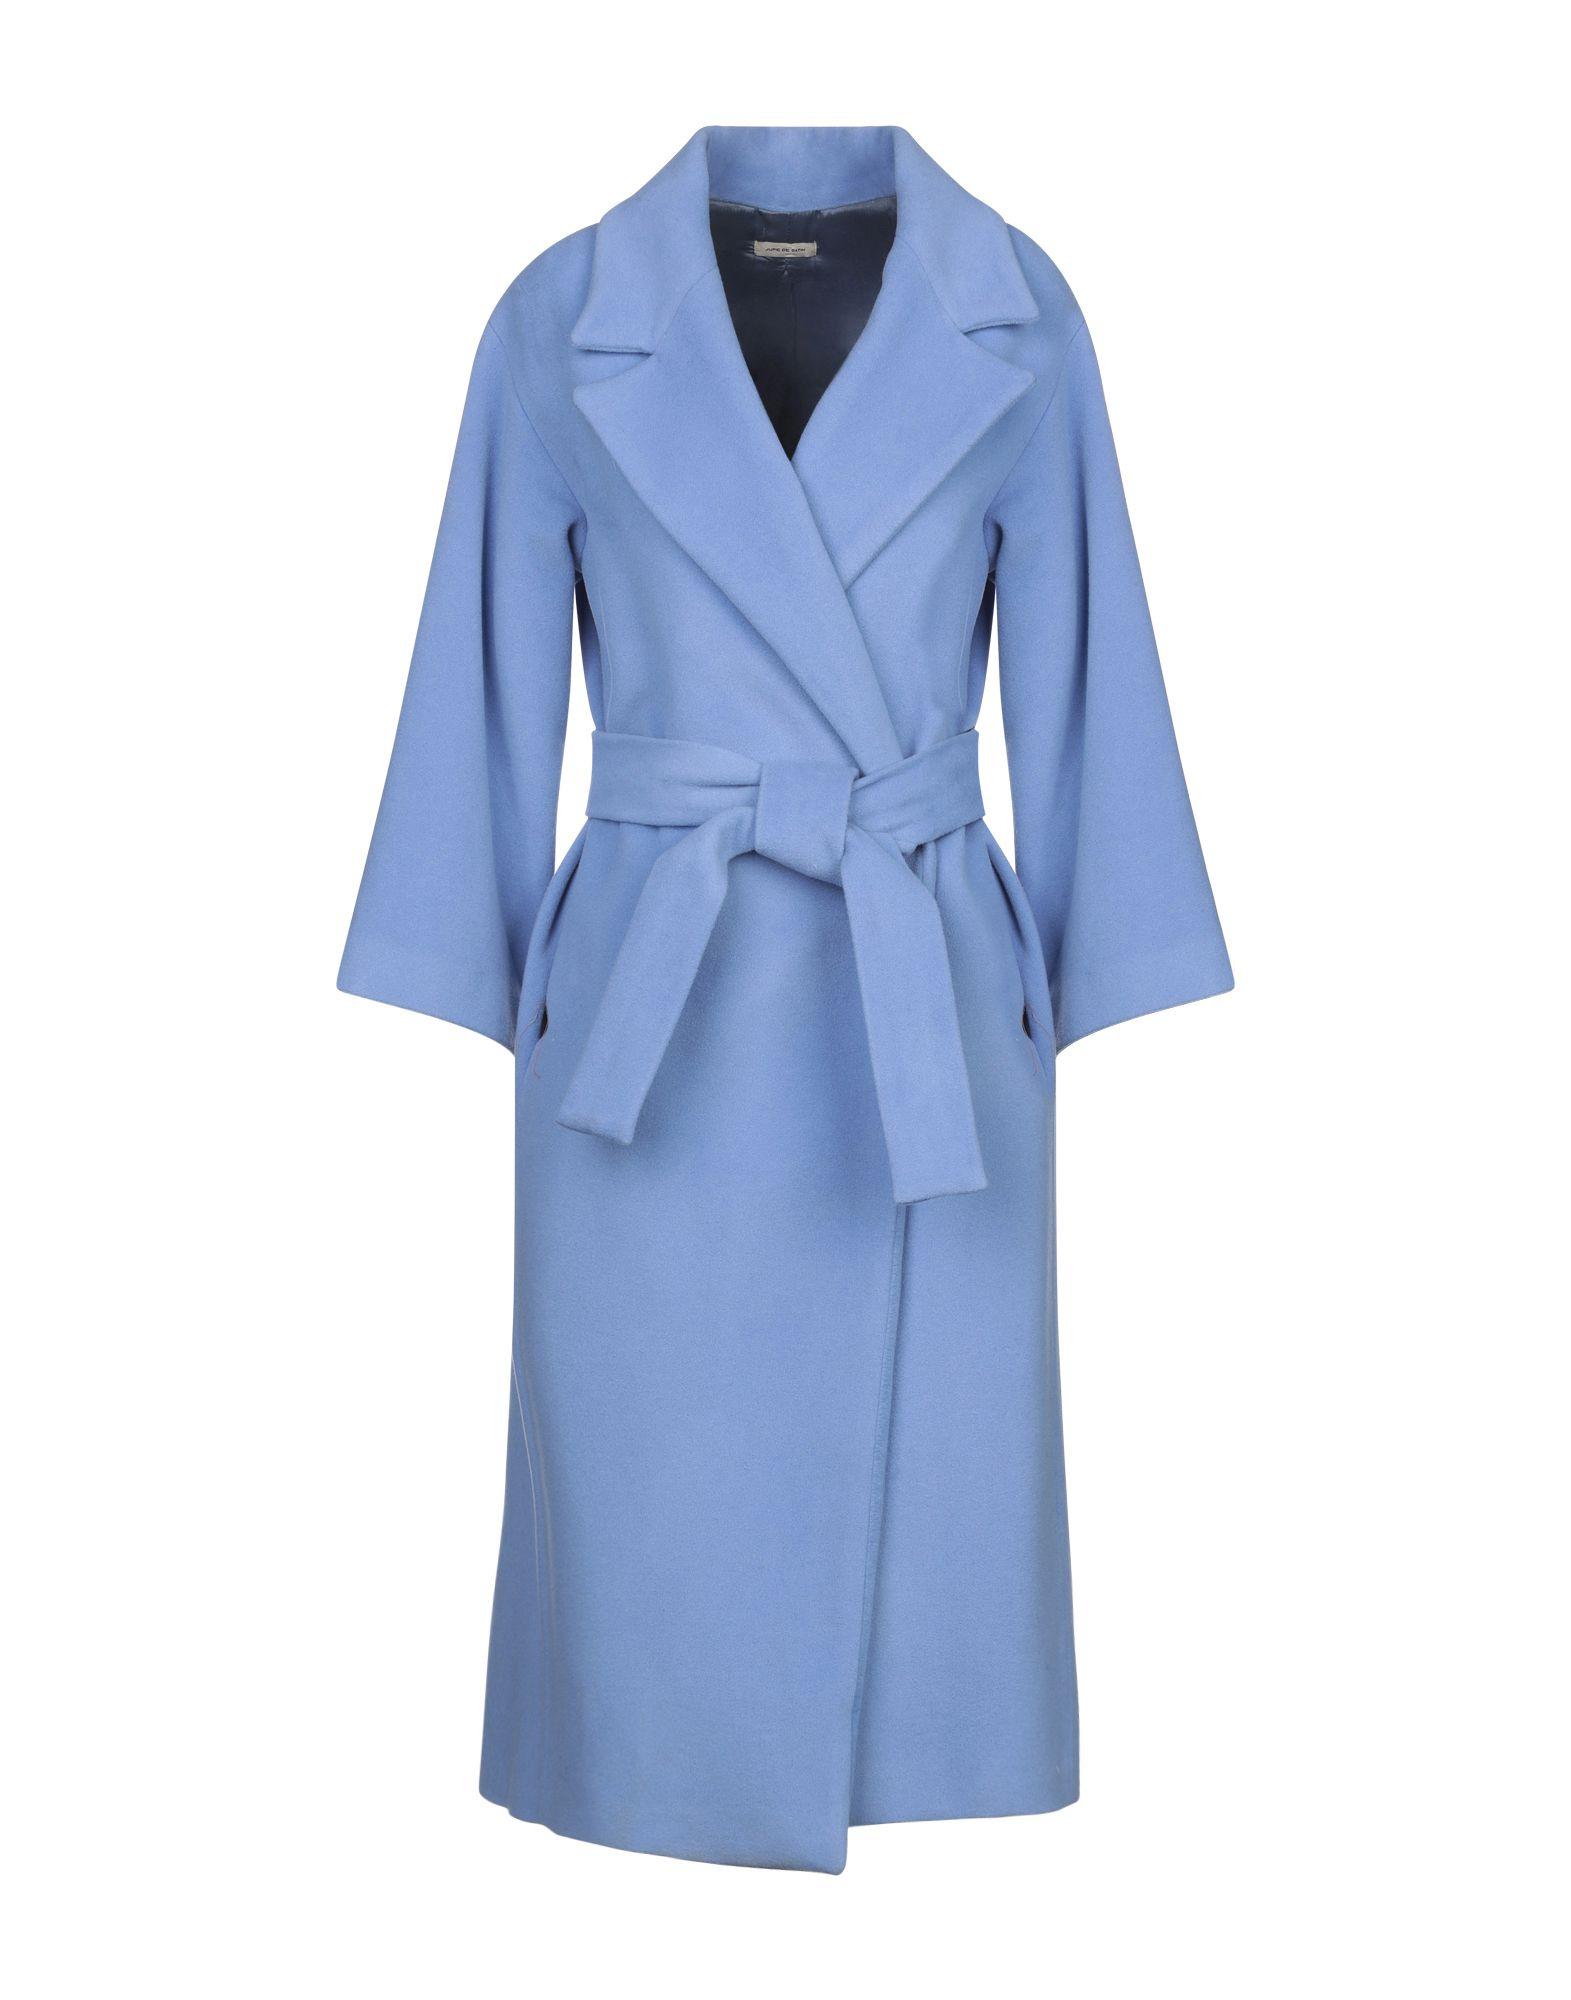 JUPE DE SATIN Пальто jupe de satin длинное платье